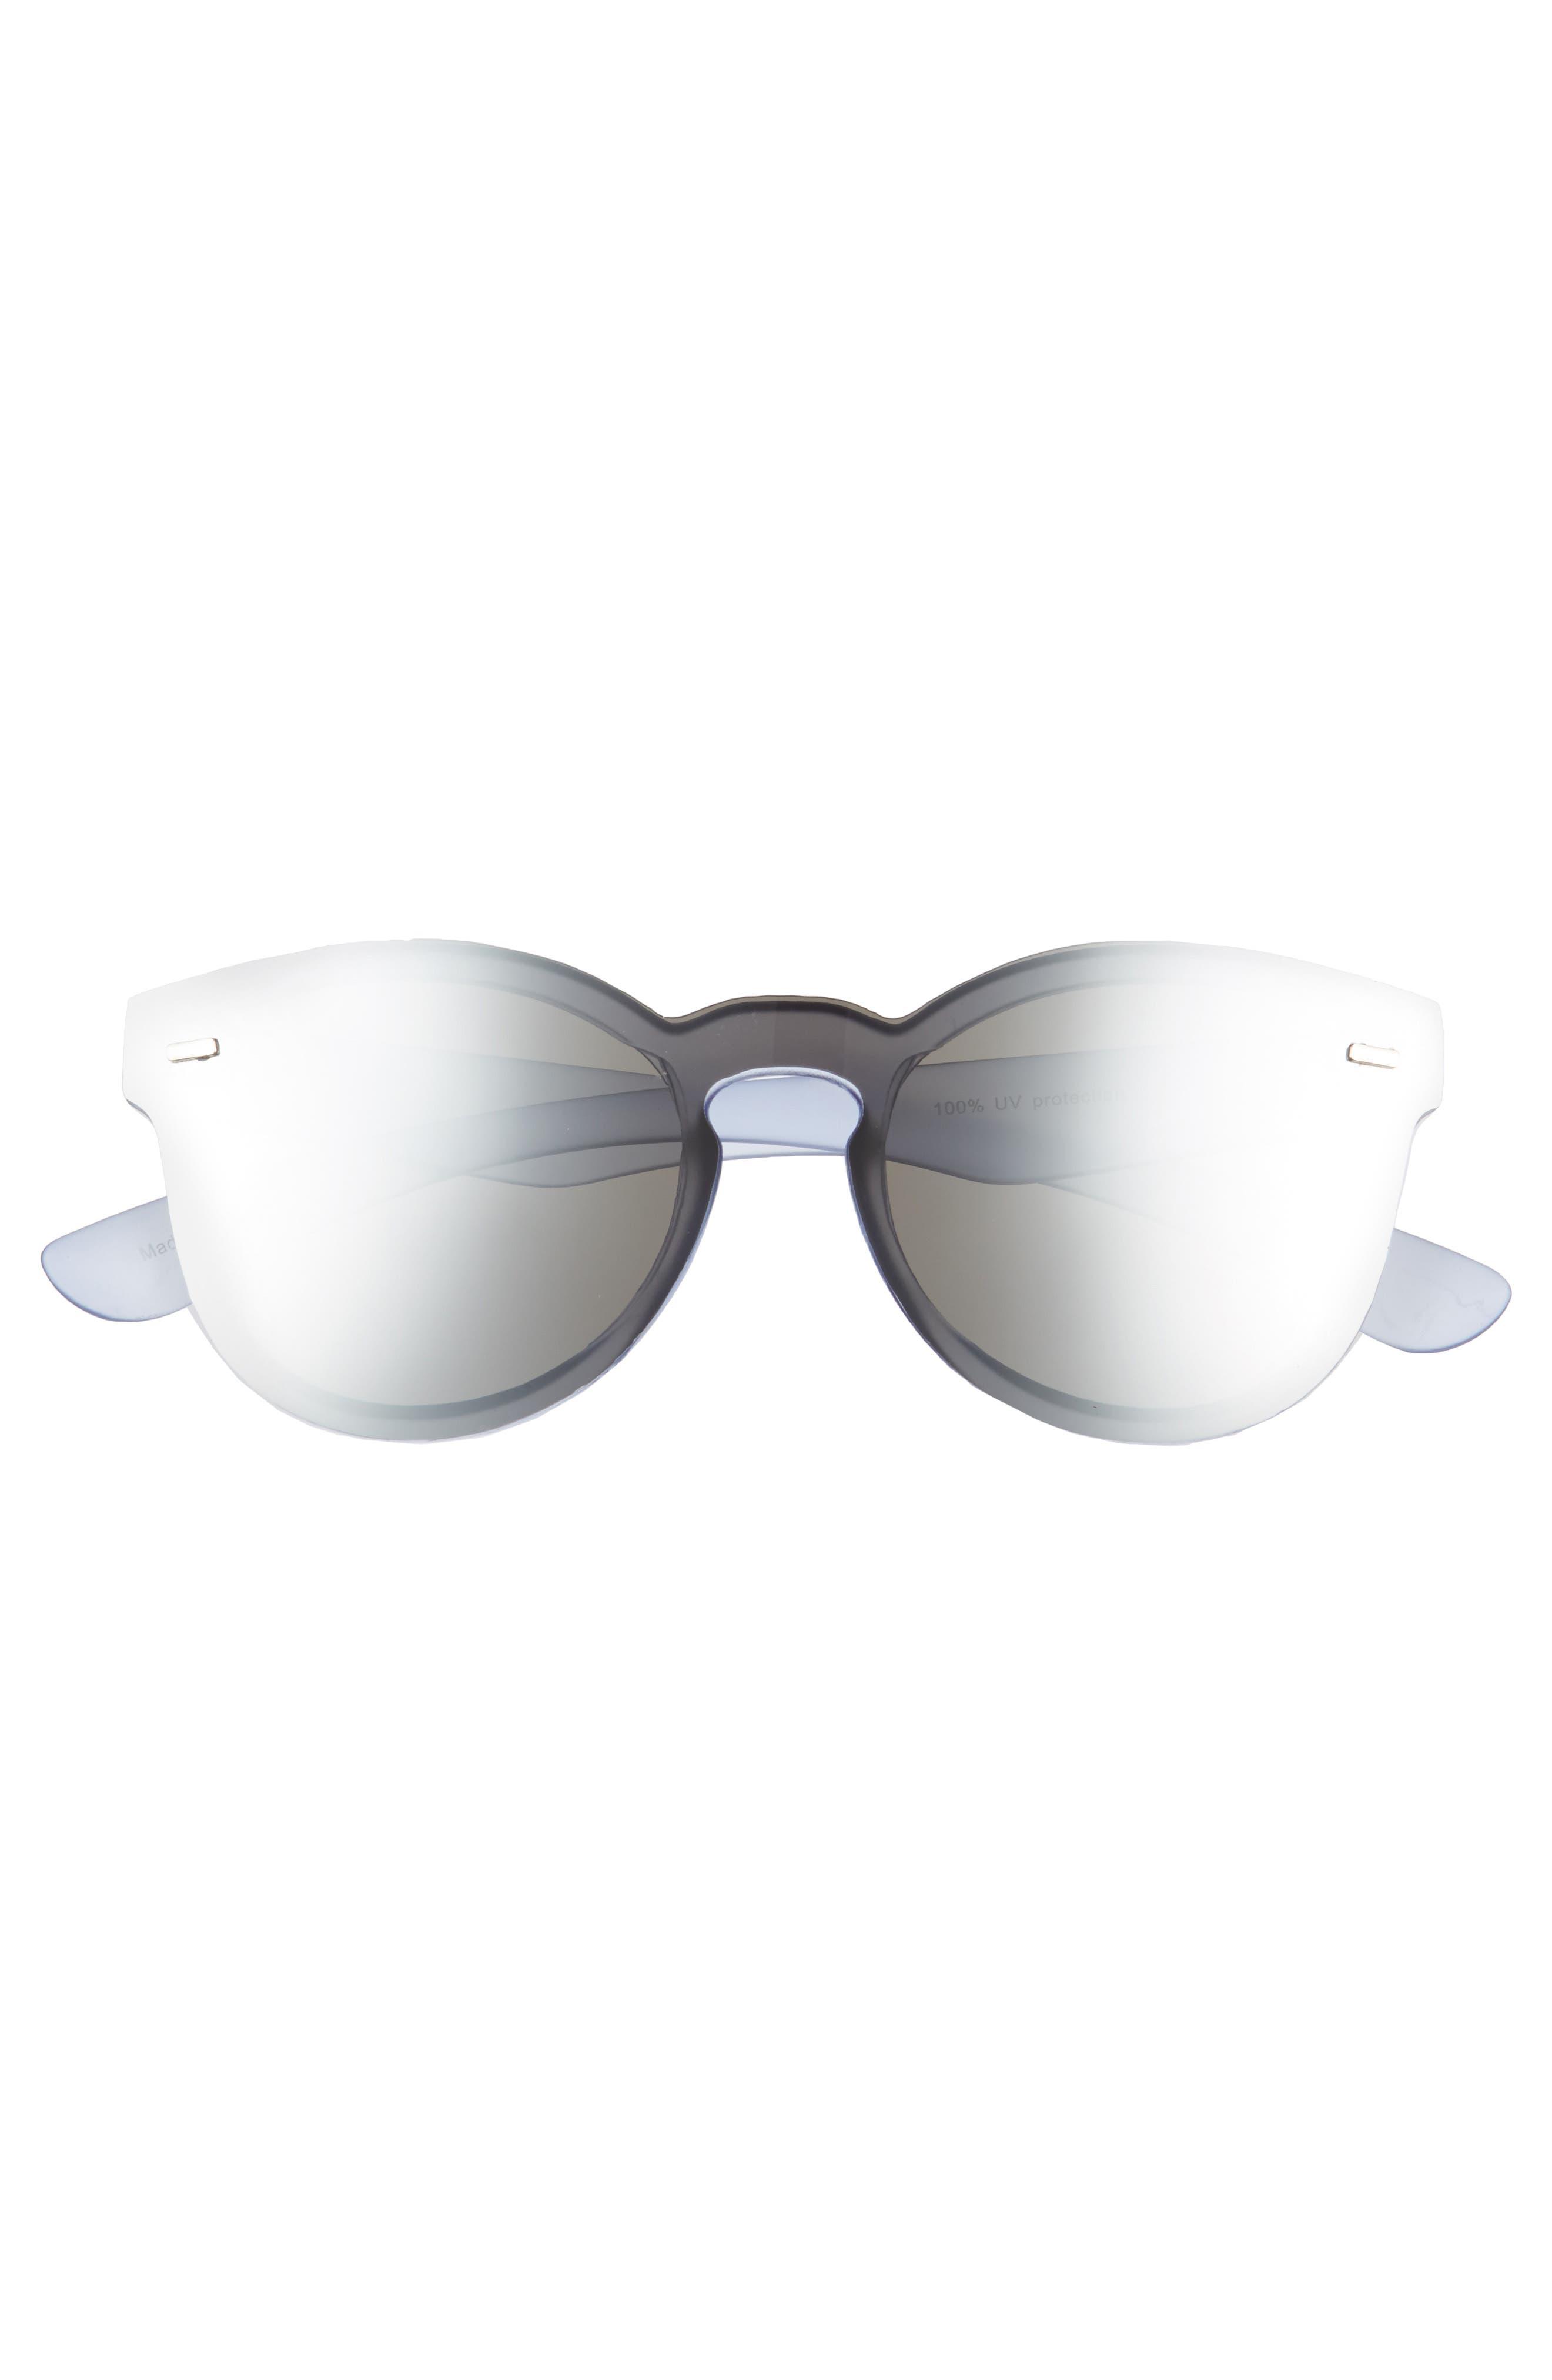 50mm Mirrored Lens Rimless Sunglasses,                             Alternate thumbnail 3, color,                             400